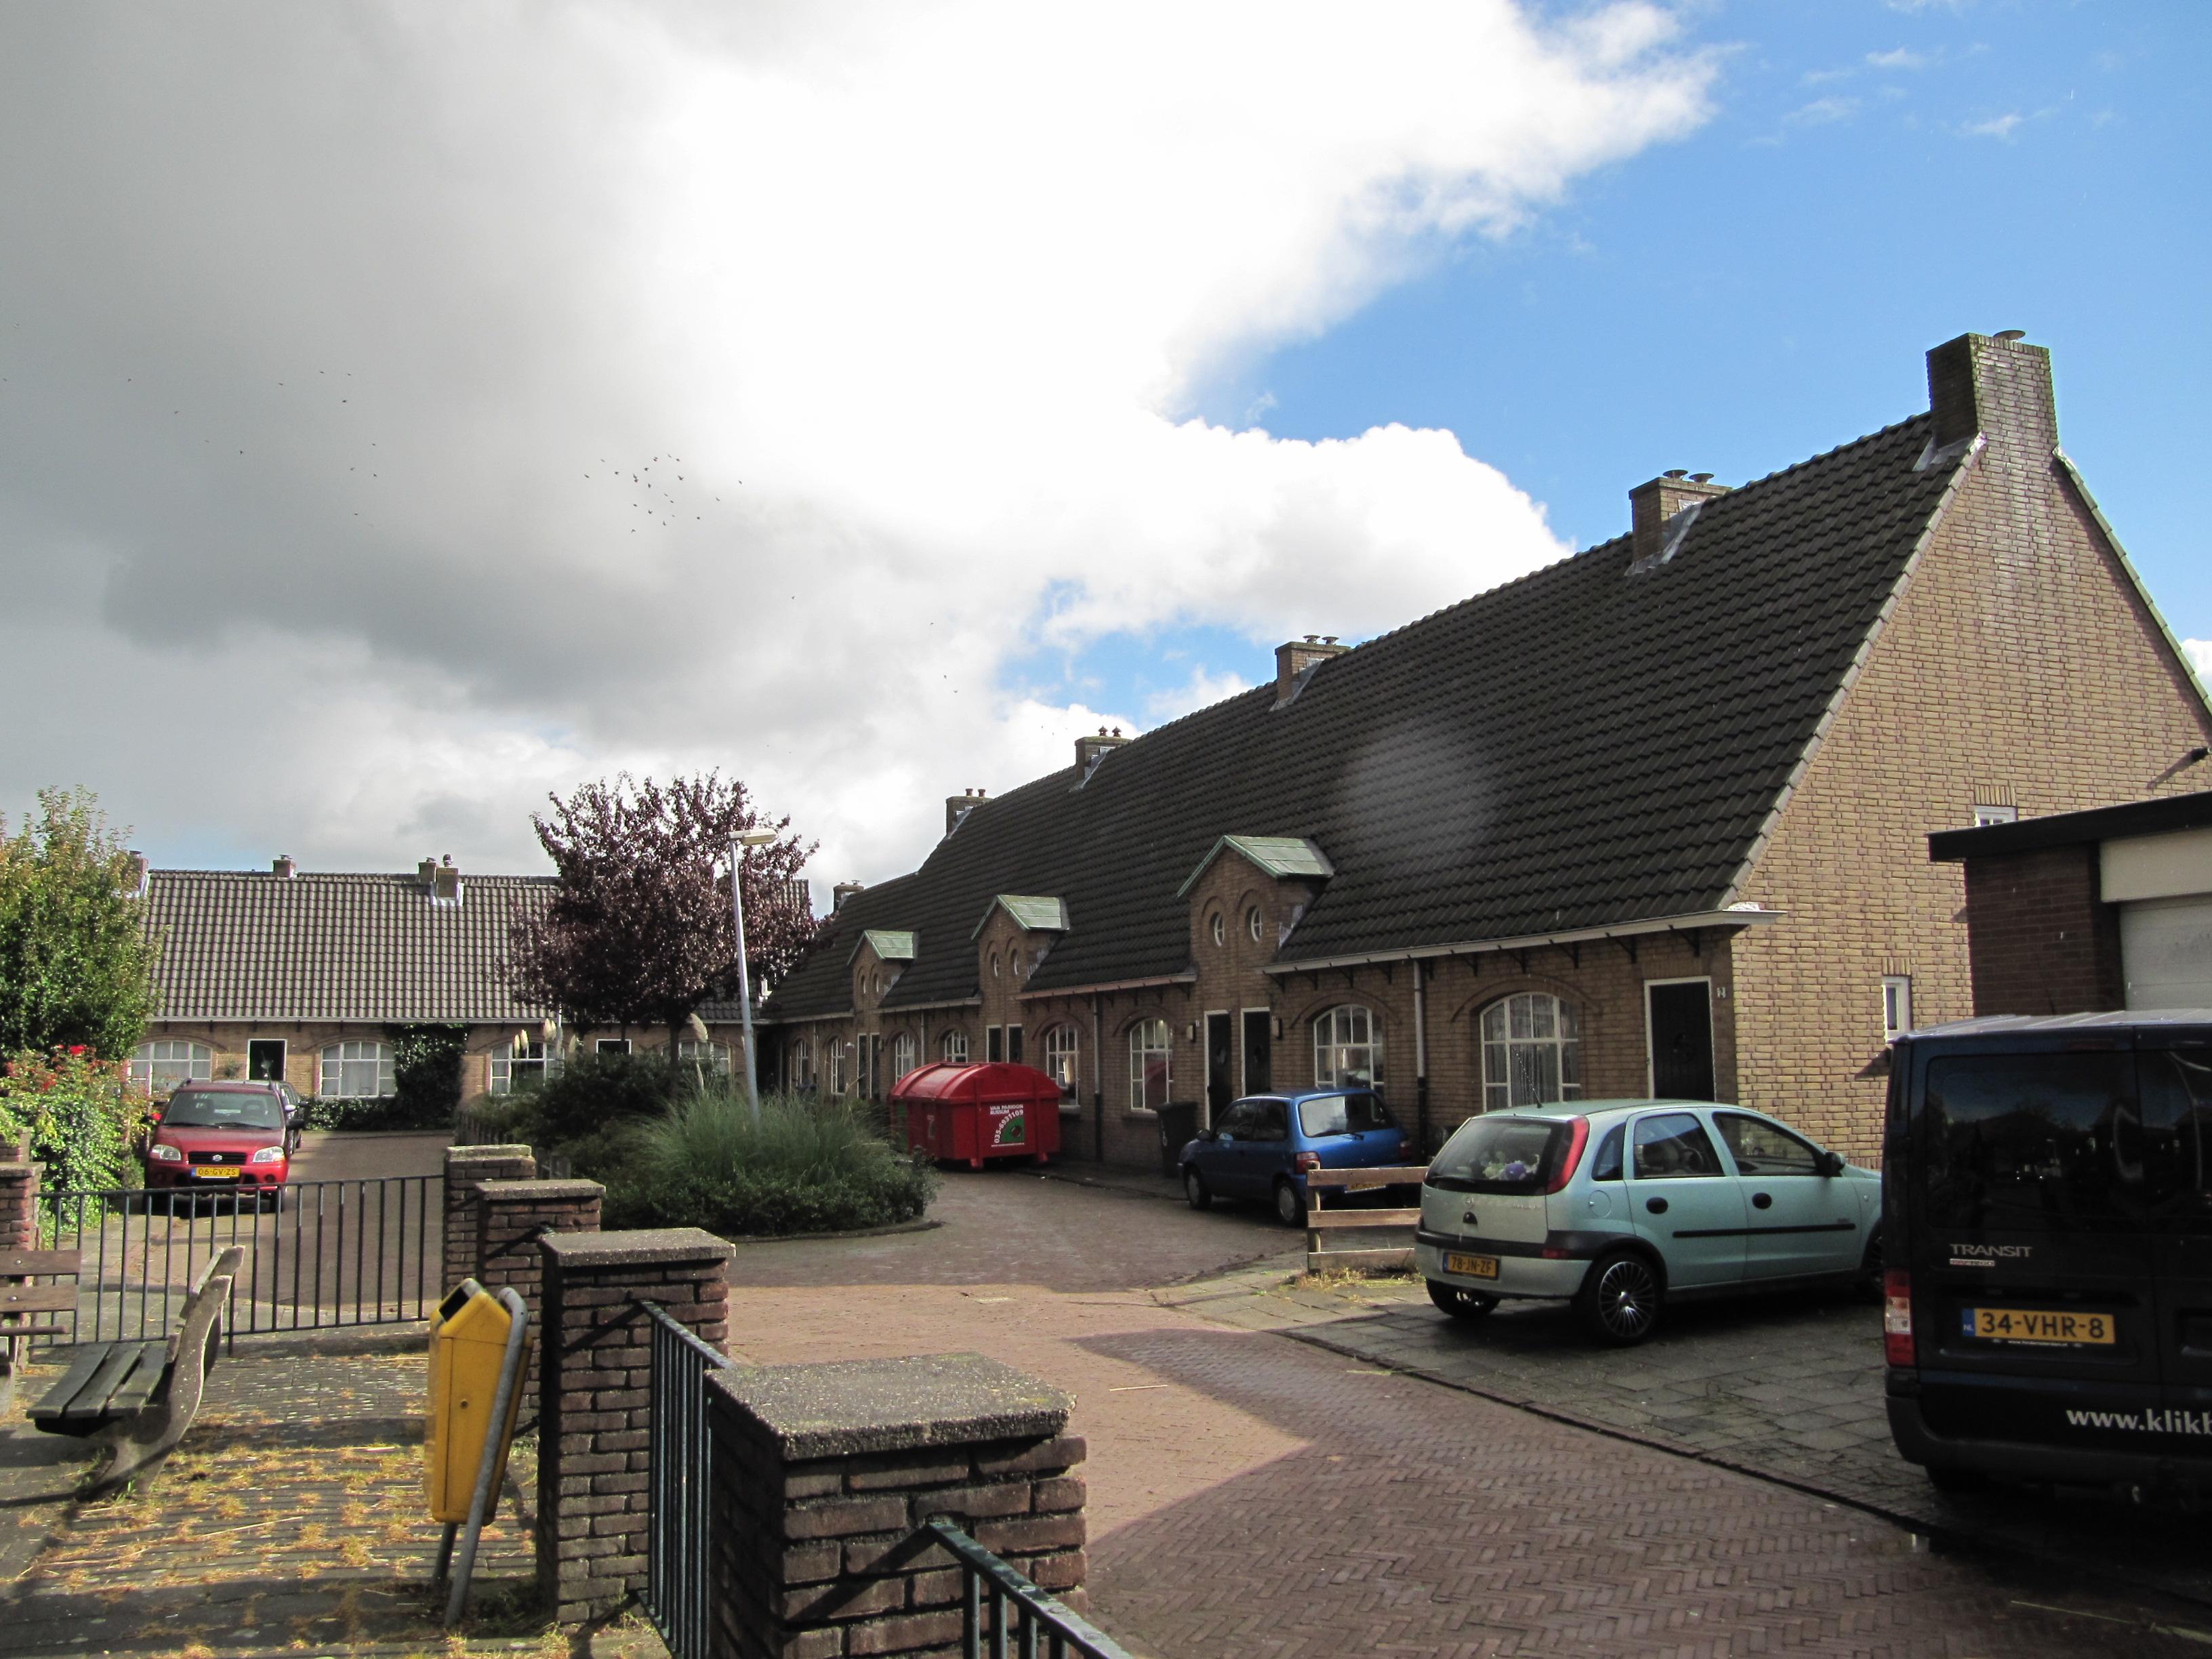 Rijtje van 5 woningen in hilversum monument for Woning hilversum